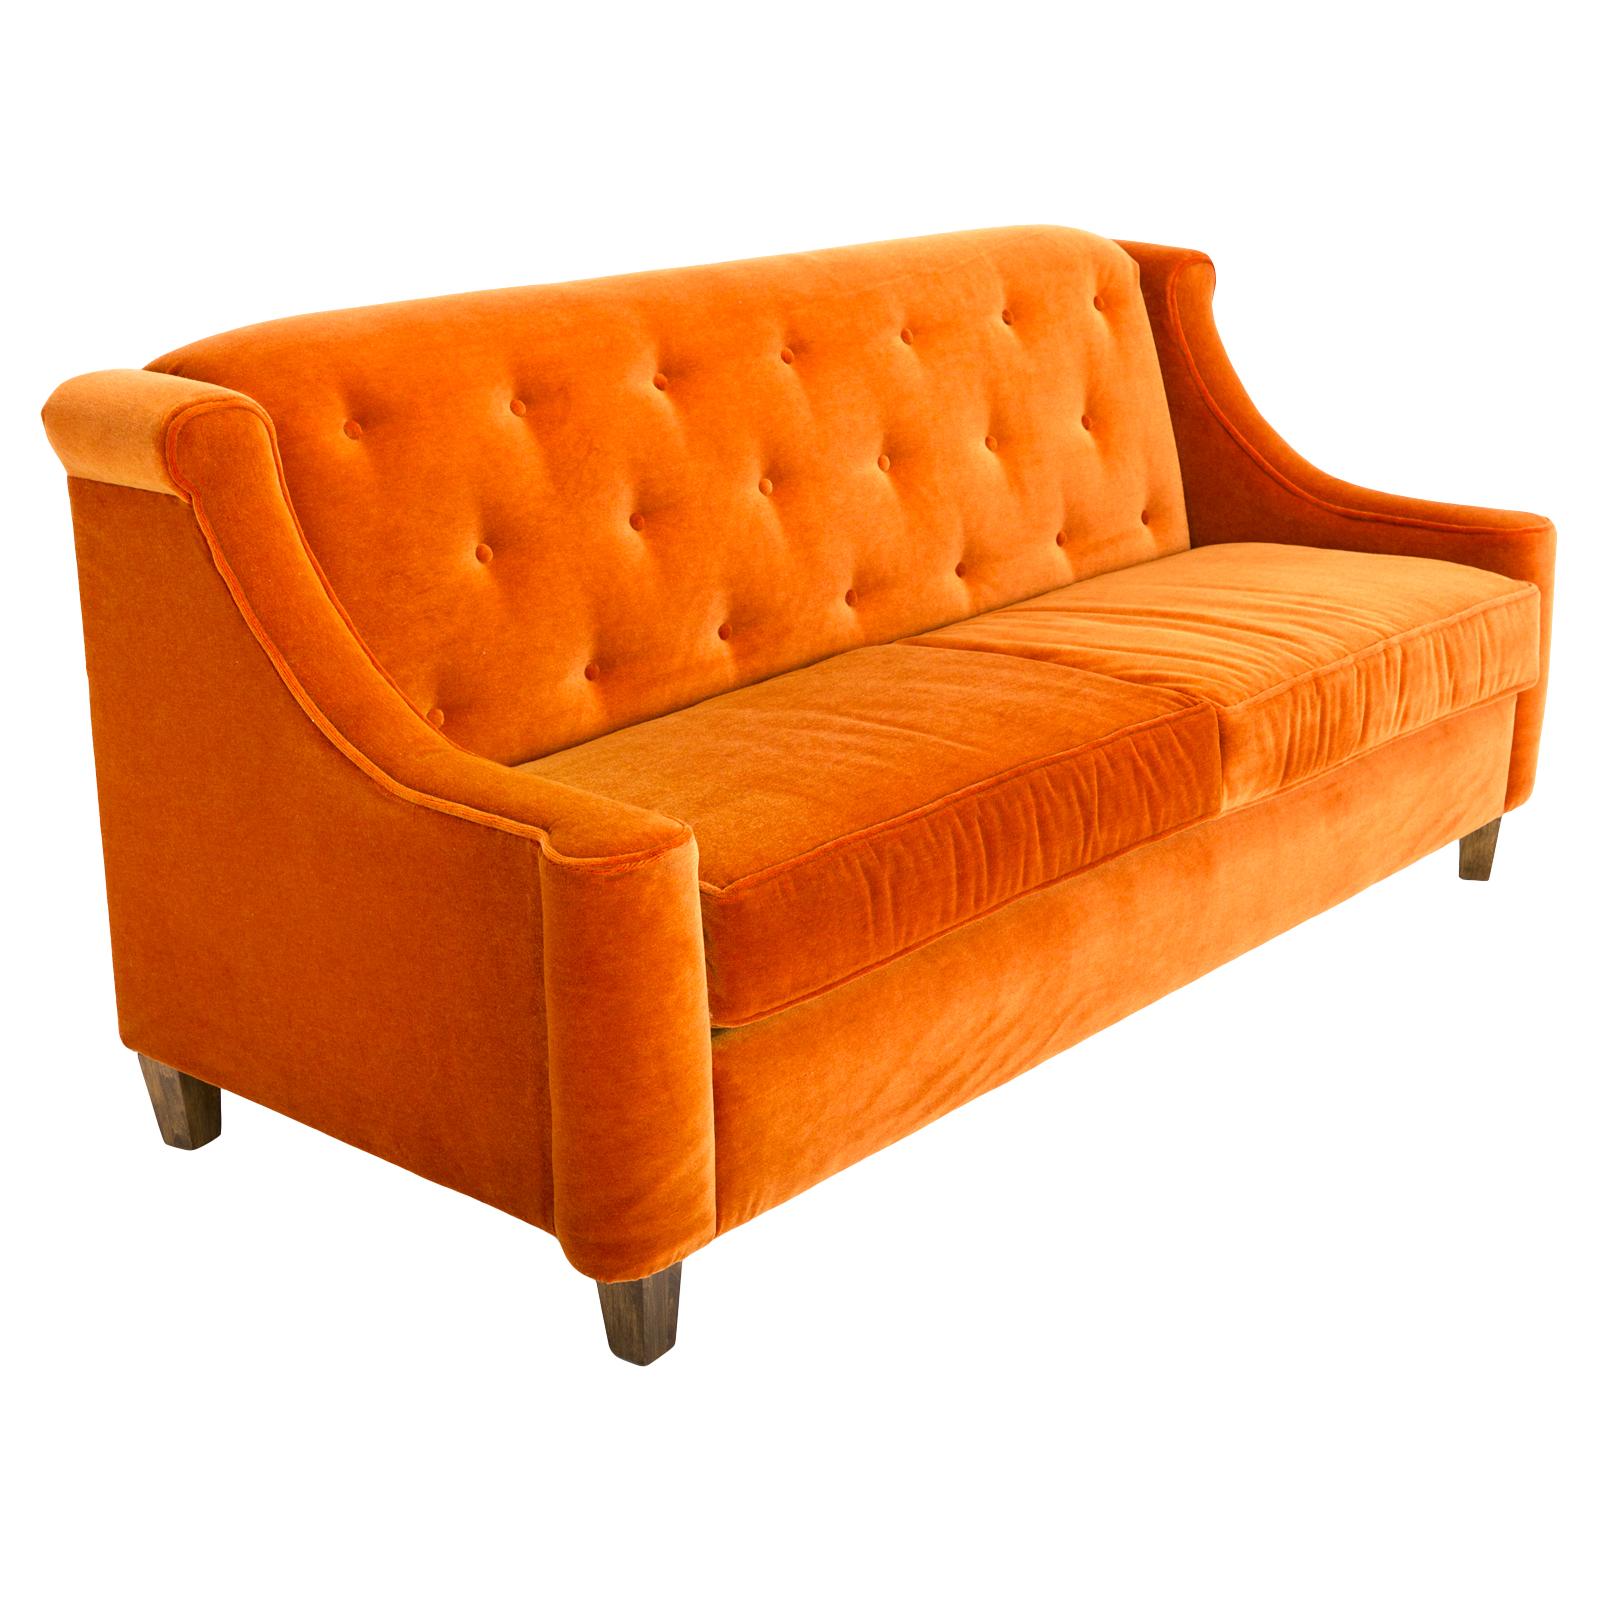 Orange Sofa Rentals | Event Furniture Rental | FormDecor